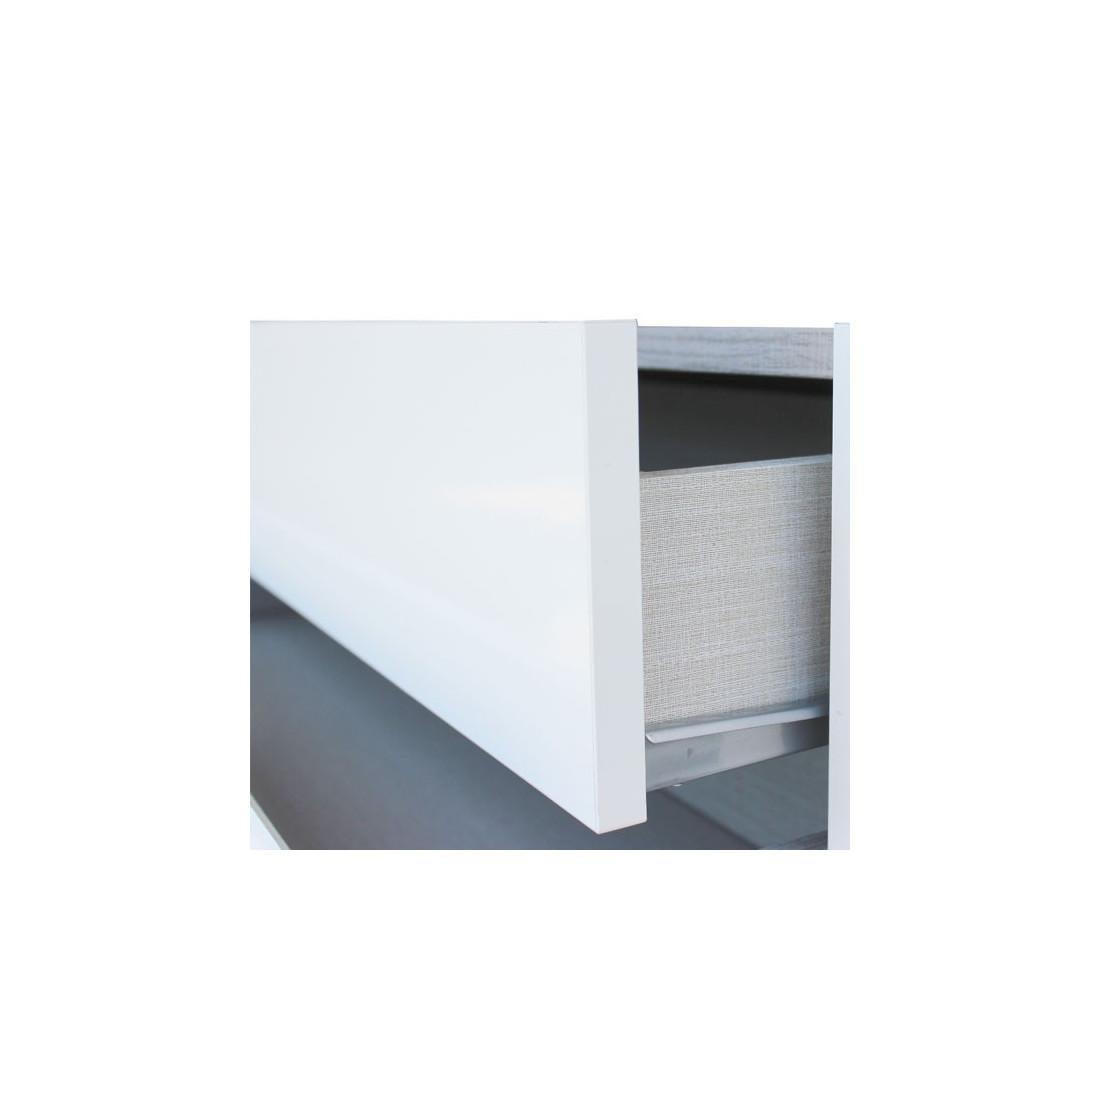 meuble d 39 entr e blanc laqu ch ne fonc miroirs nosila petits meubles. Black Bedroom Furniture Sets. Home Design Ideas